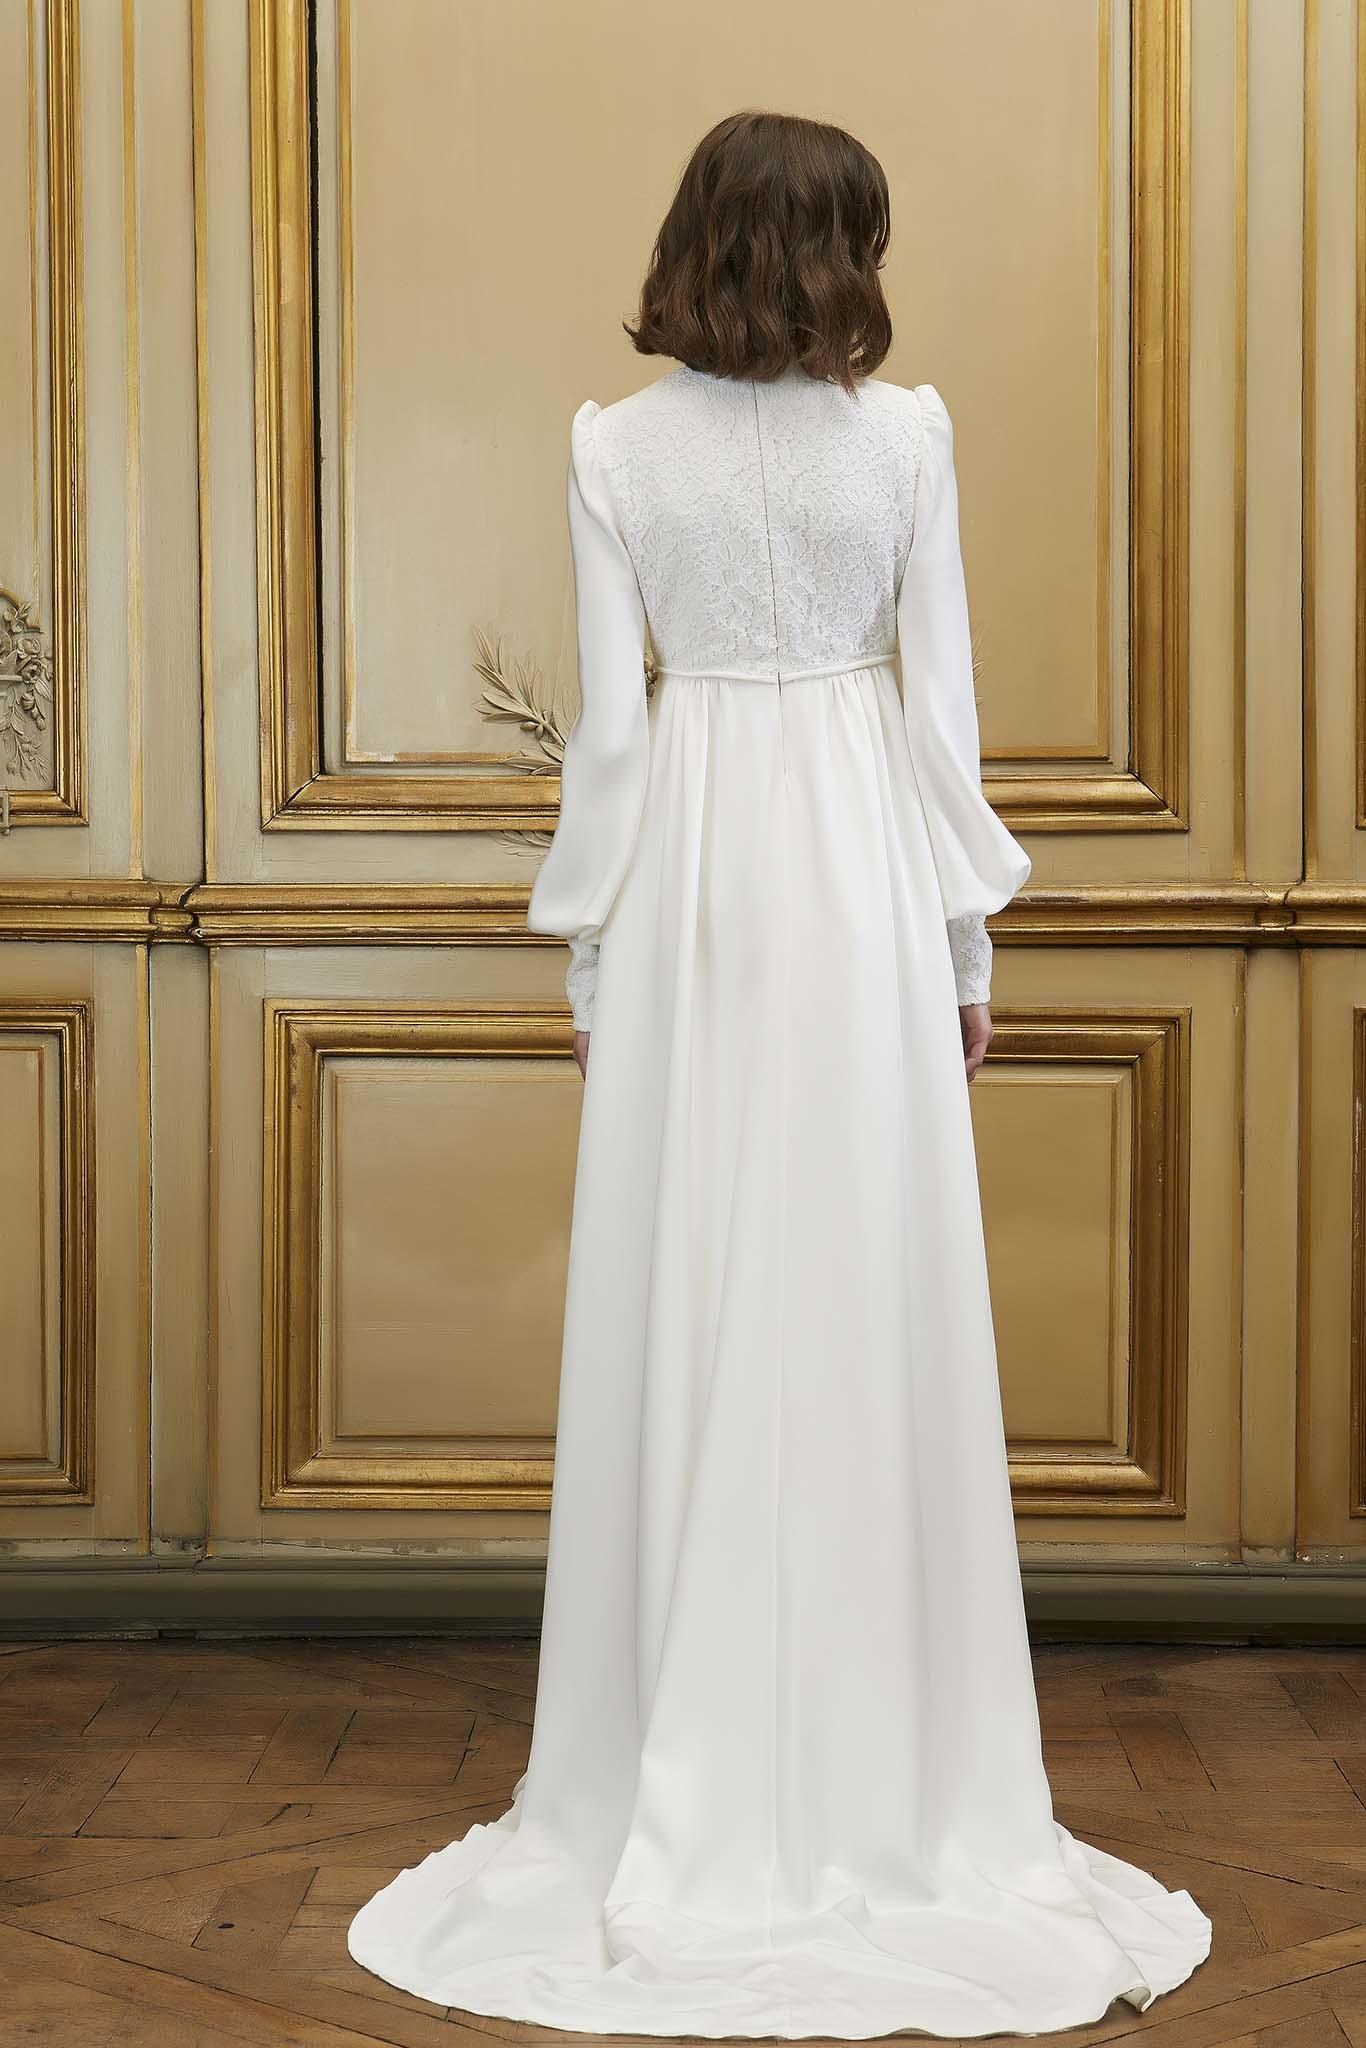 Delphine Manivet Jonas Wedding Dress